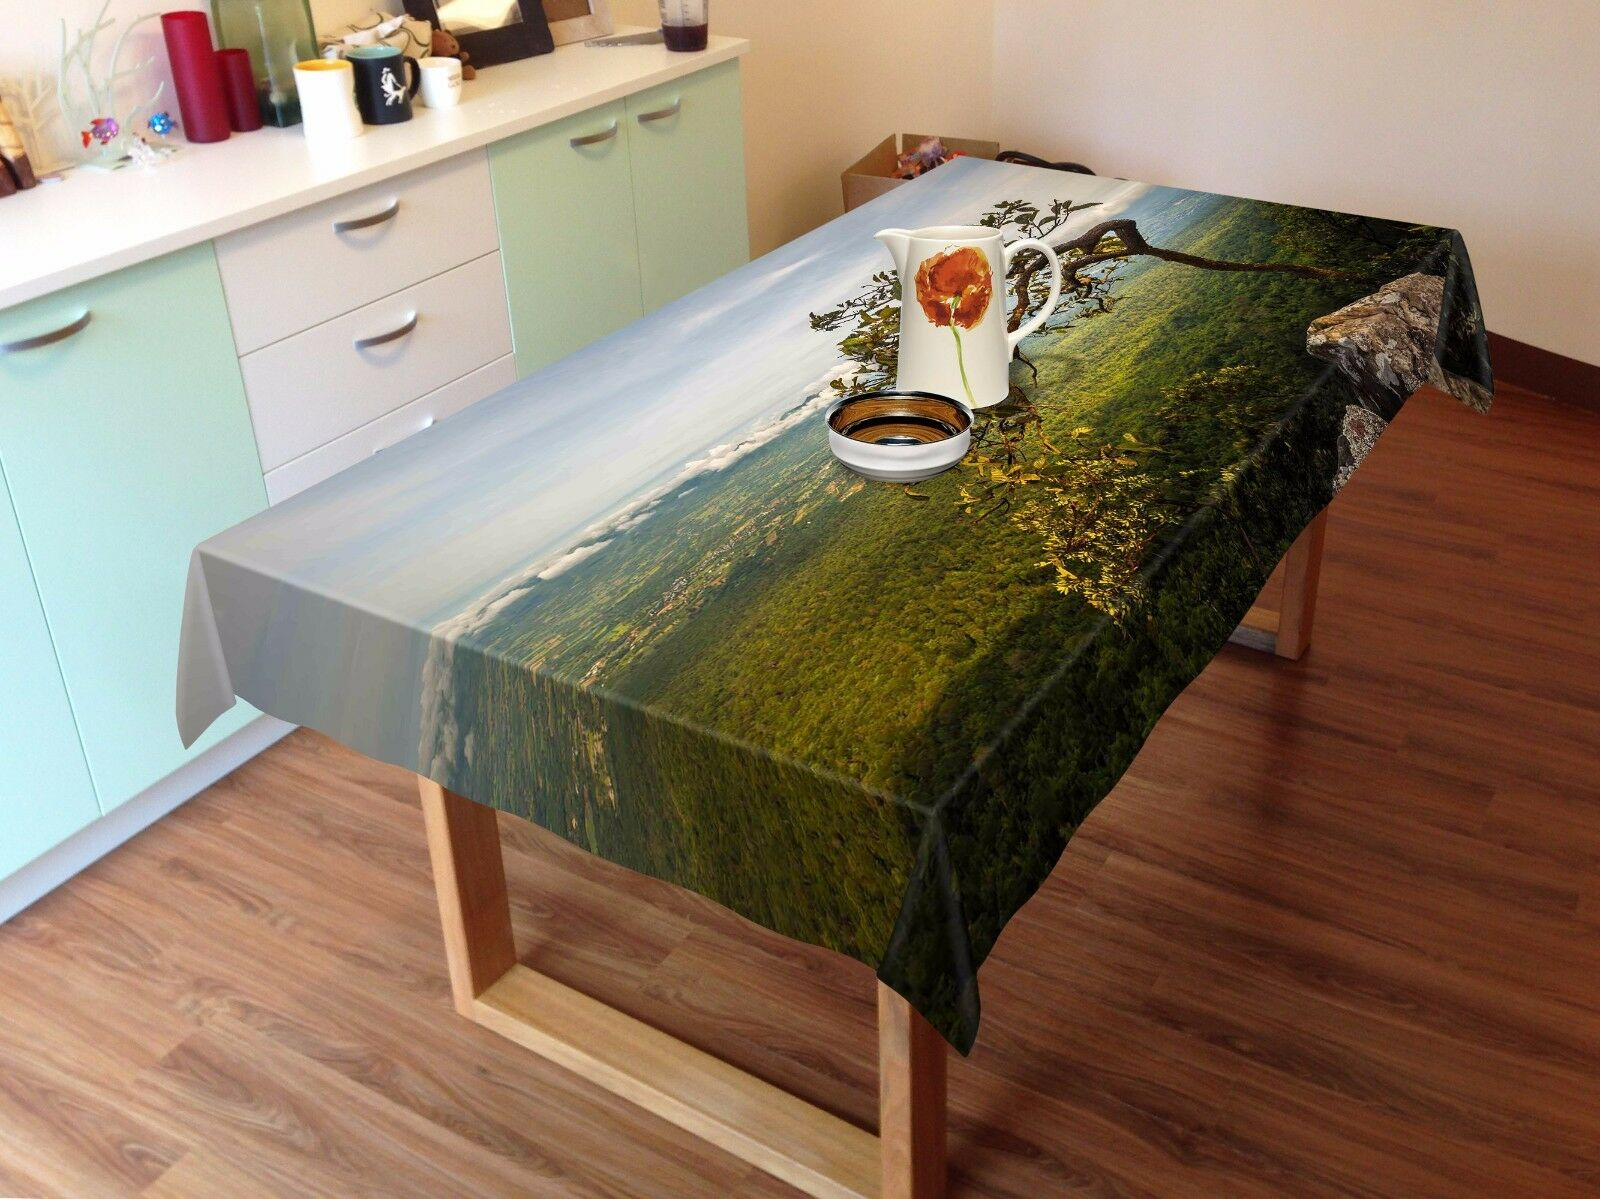 3D Trees 55 Tablecloth Tablecloth Tablecloth Table Cover Cloth Birthday Party AJ WALLPAPER UK Lemon 9c9e07